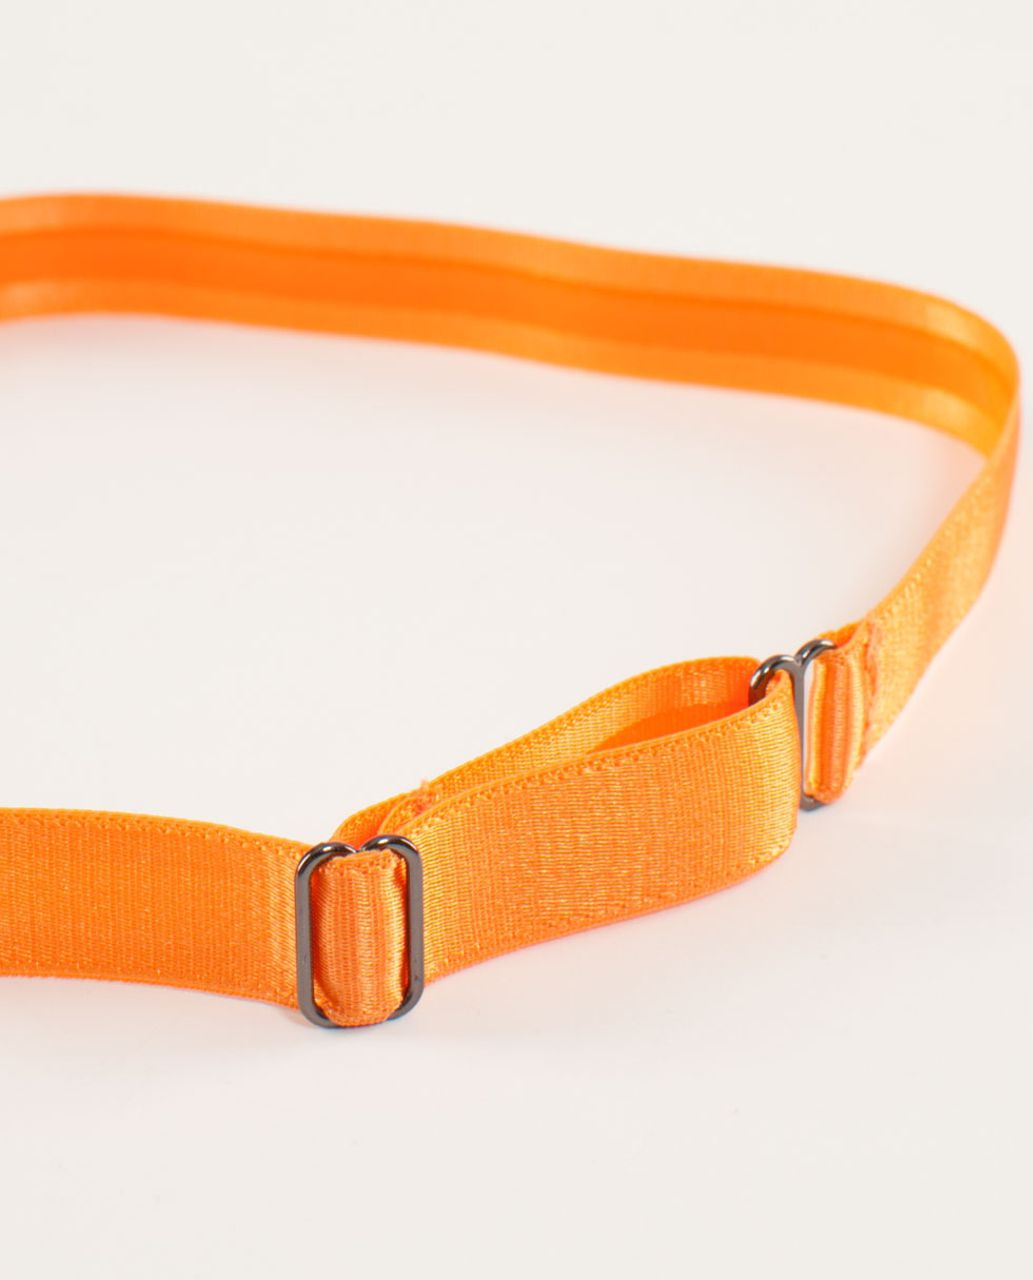 Lululemon Skinny Satin Pirouette - Orange Glow